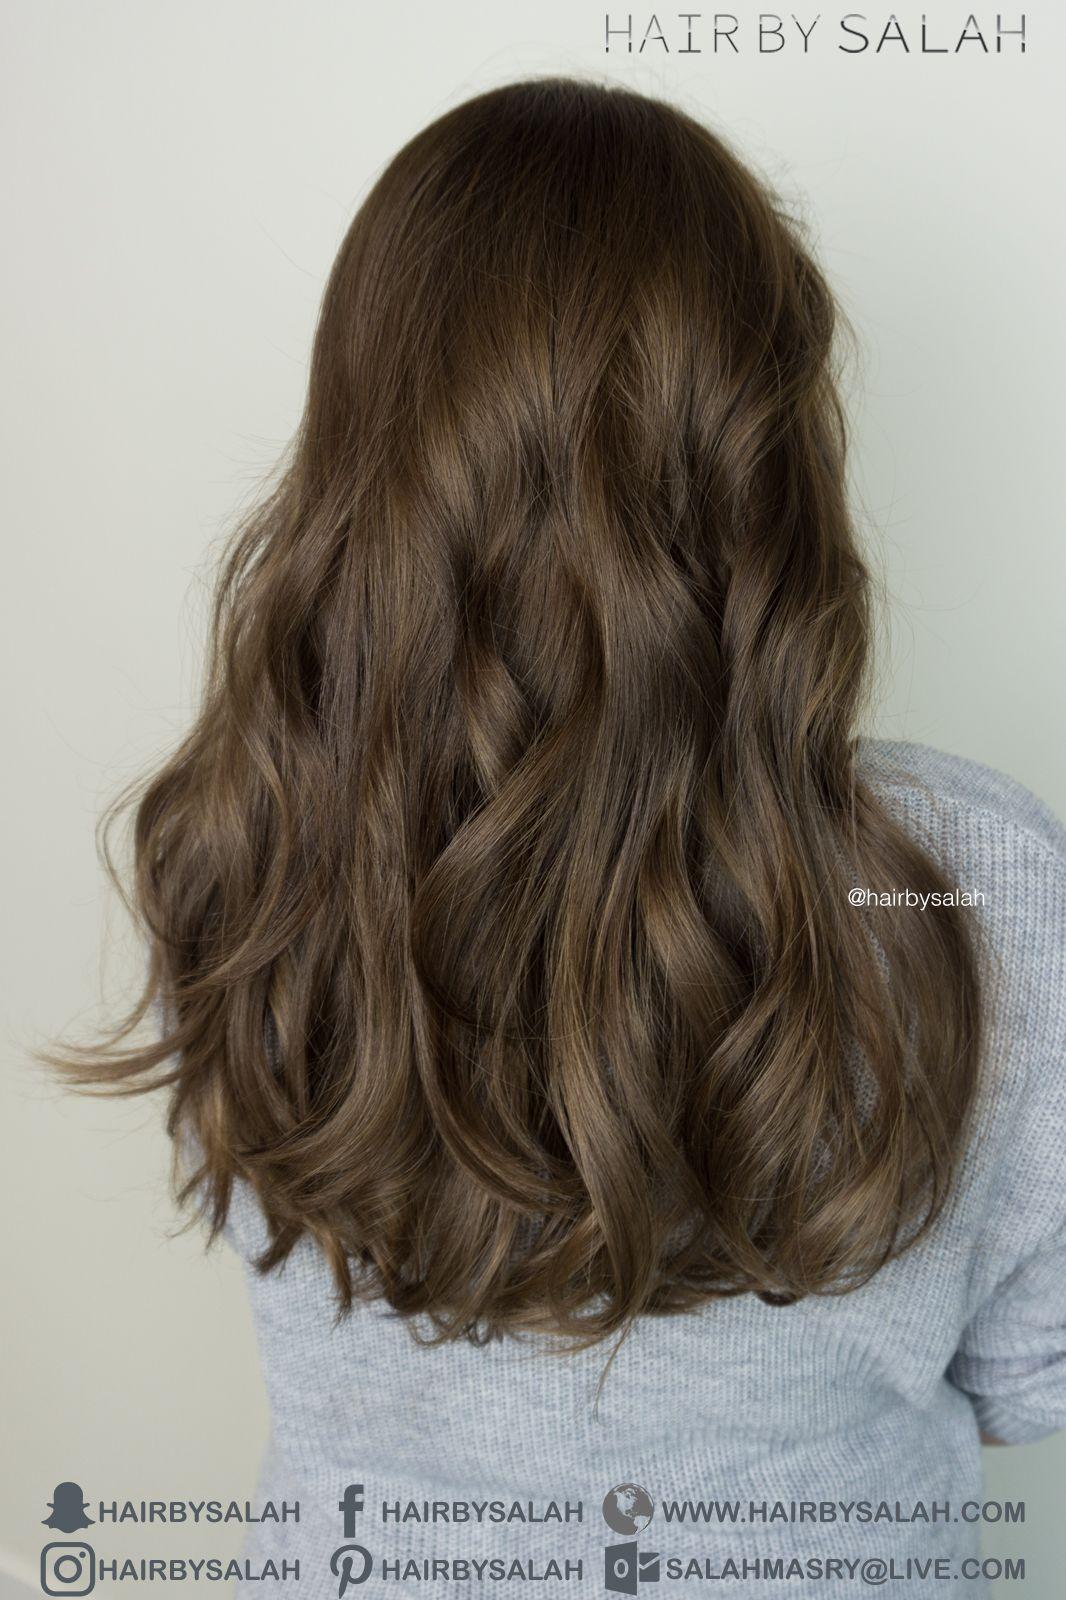 Hair Colors Light Brown Hair Hair Color Light Brown Brown Hair Dye,Best 3 In 1 Apple Charging Station Airpod Pro